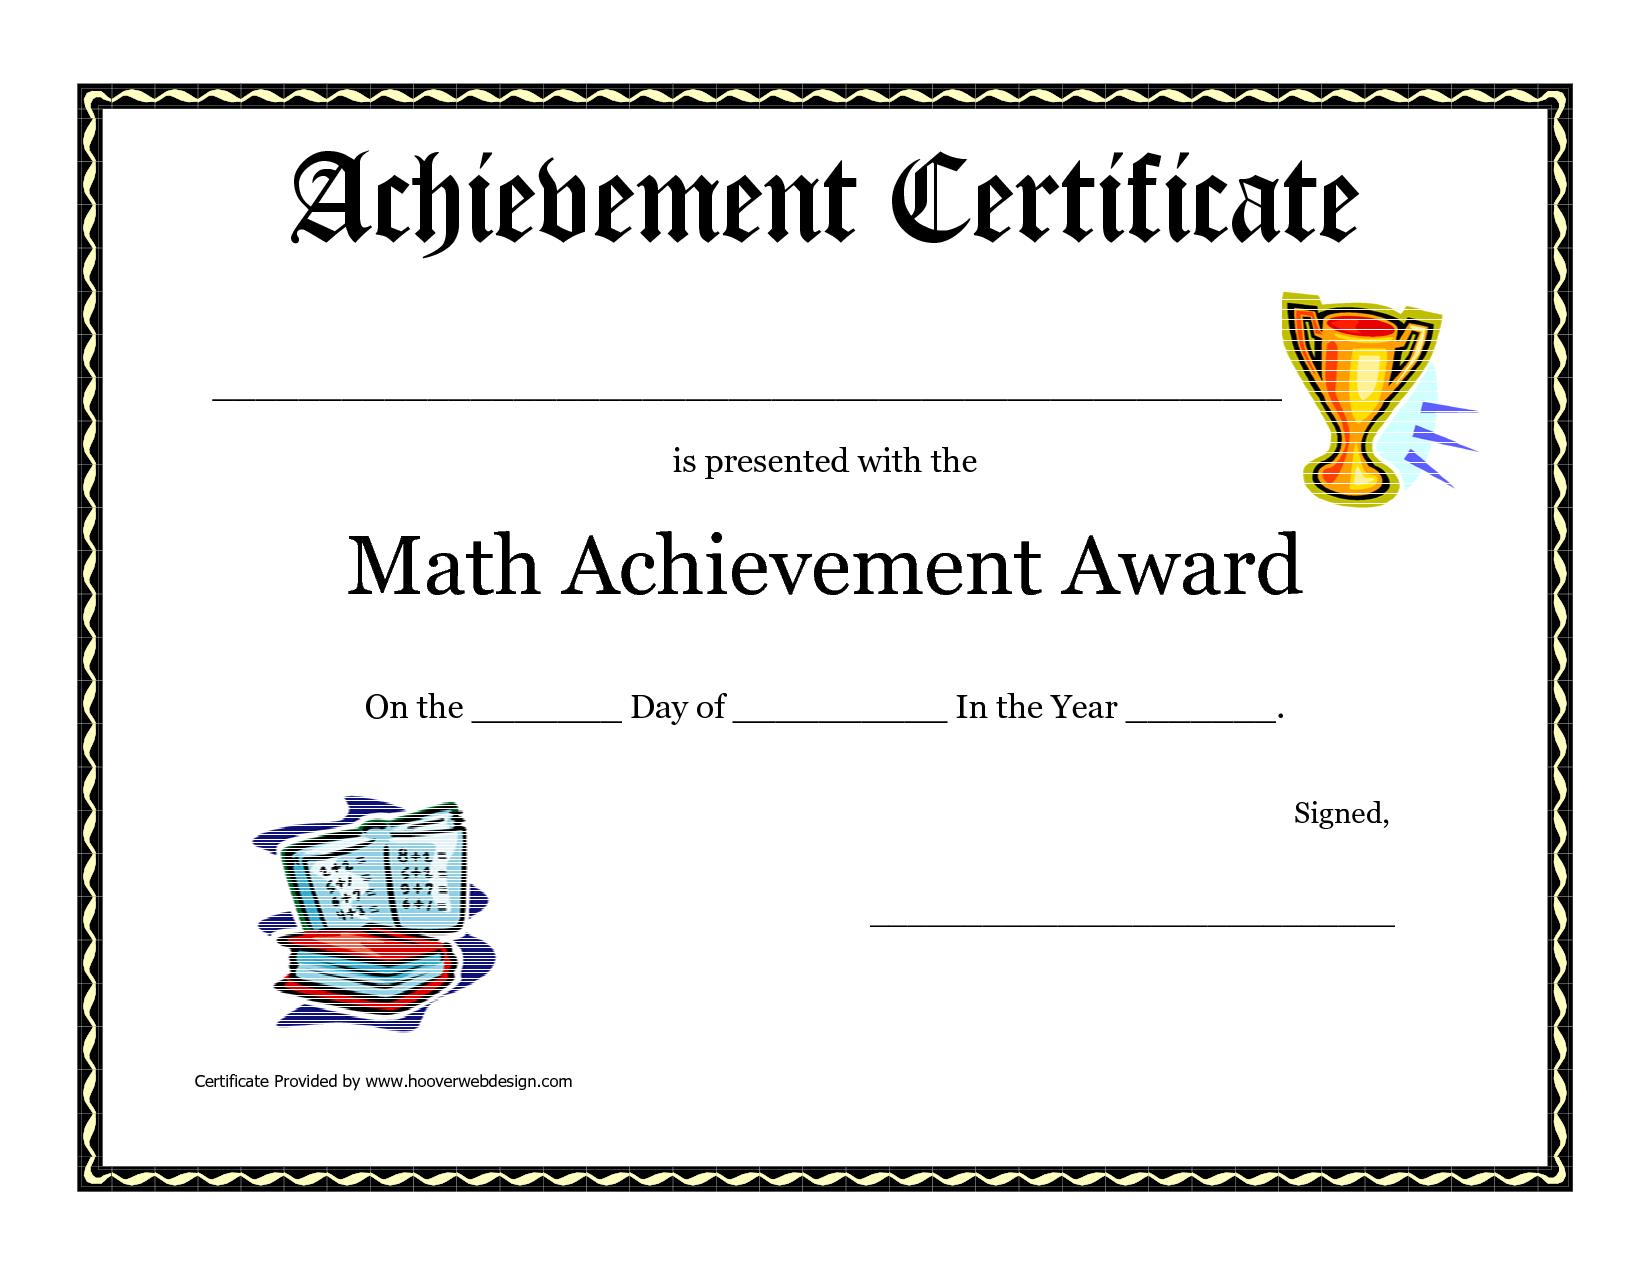 Math Achievement Award Printable Certificate Pdf  Math Activites For Math Certificate Template